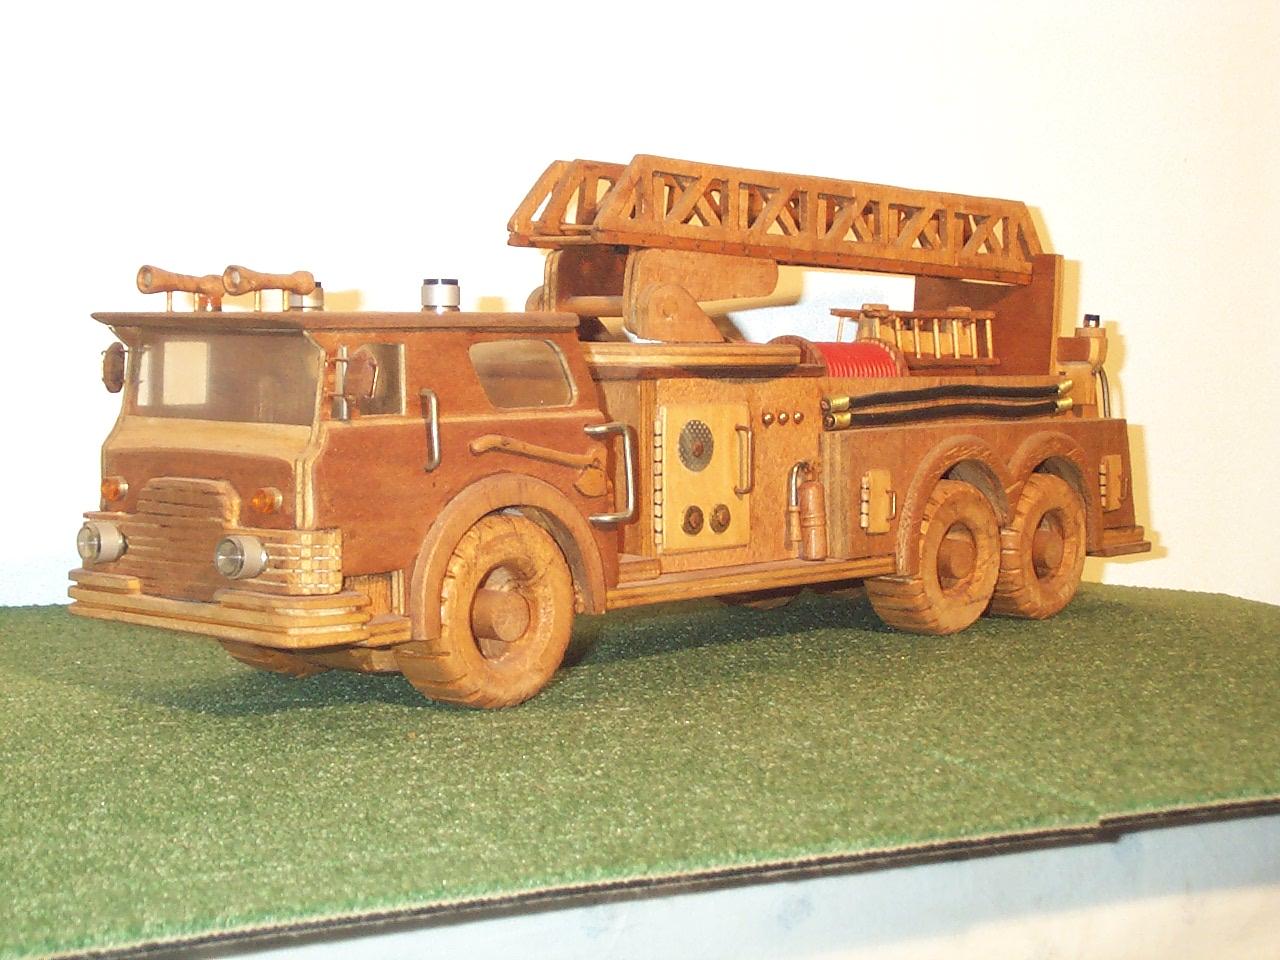 camion pompier am ricain maquette en bois cabrera. Black Bedroom Furniture Sets. Home Design Ideas